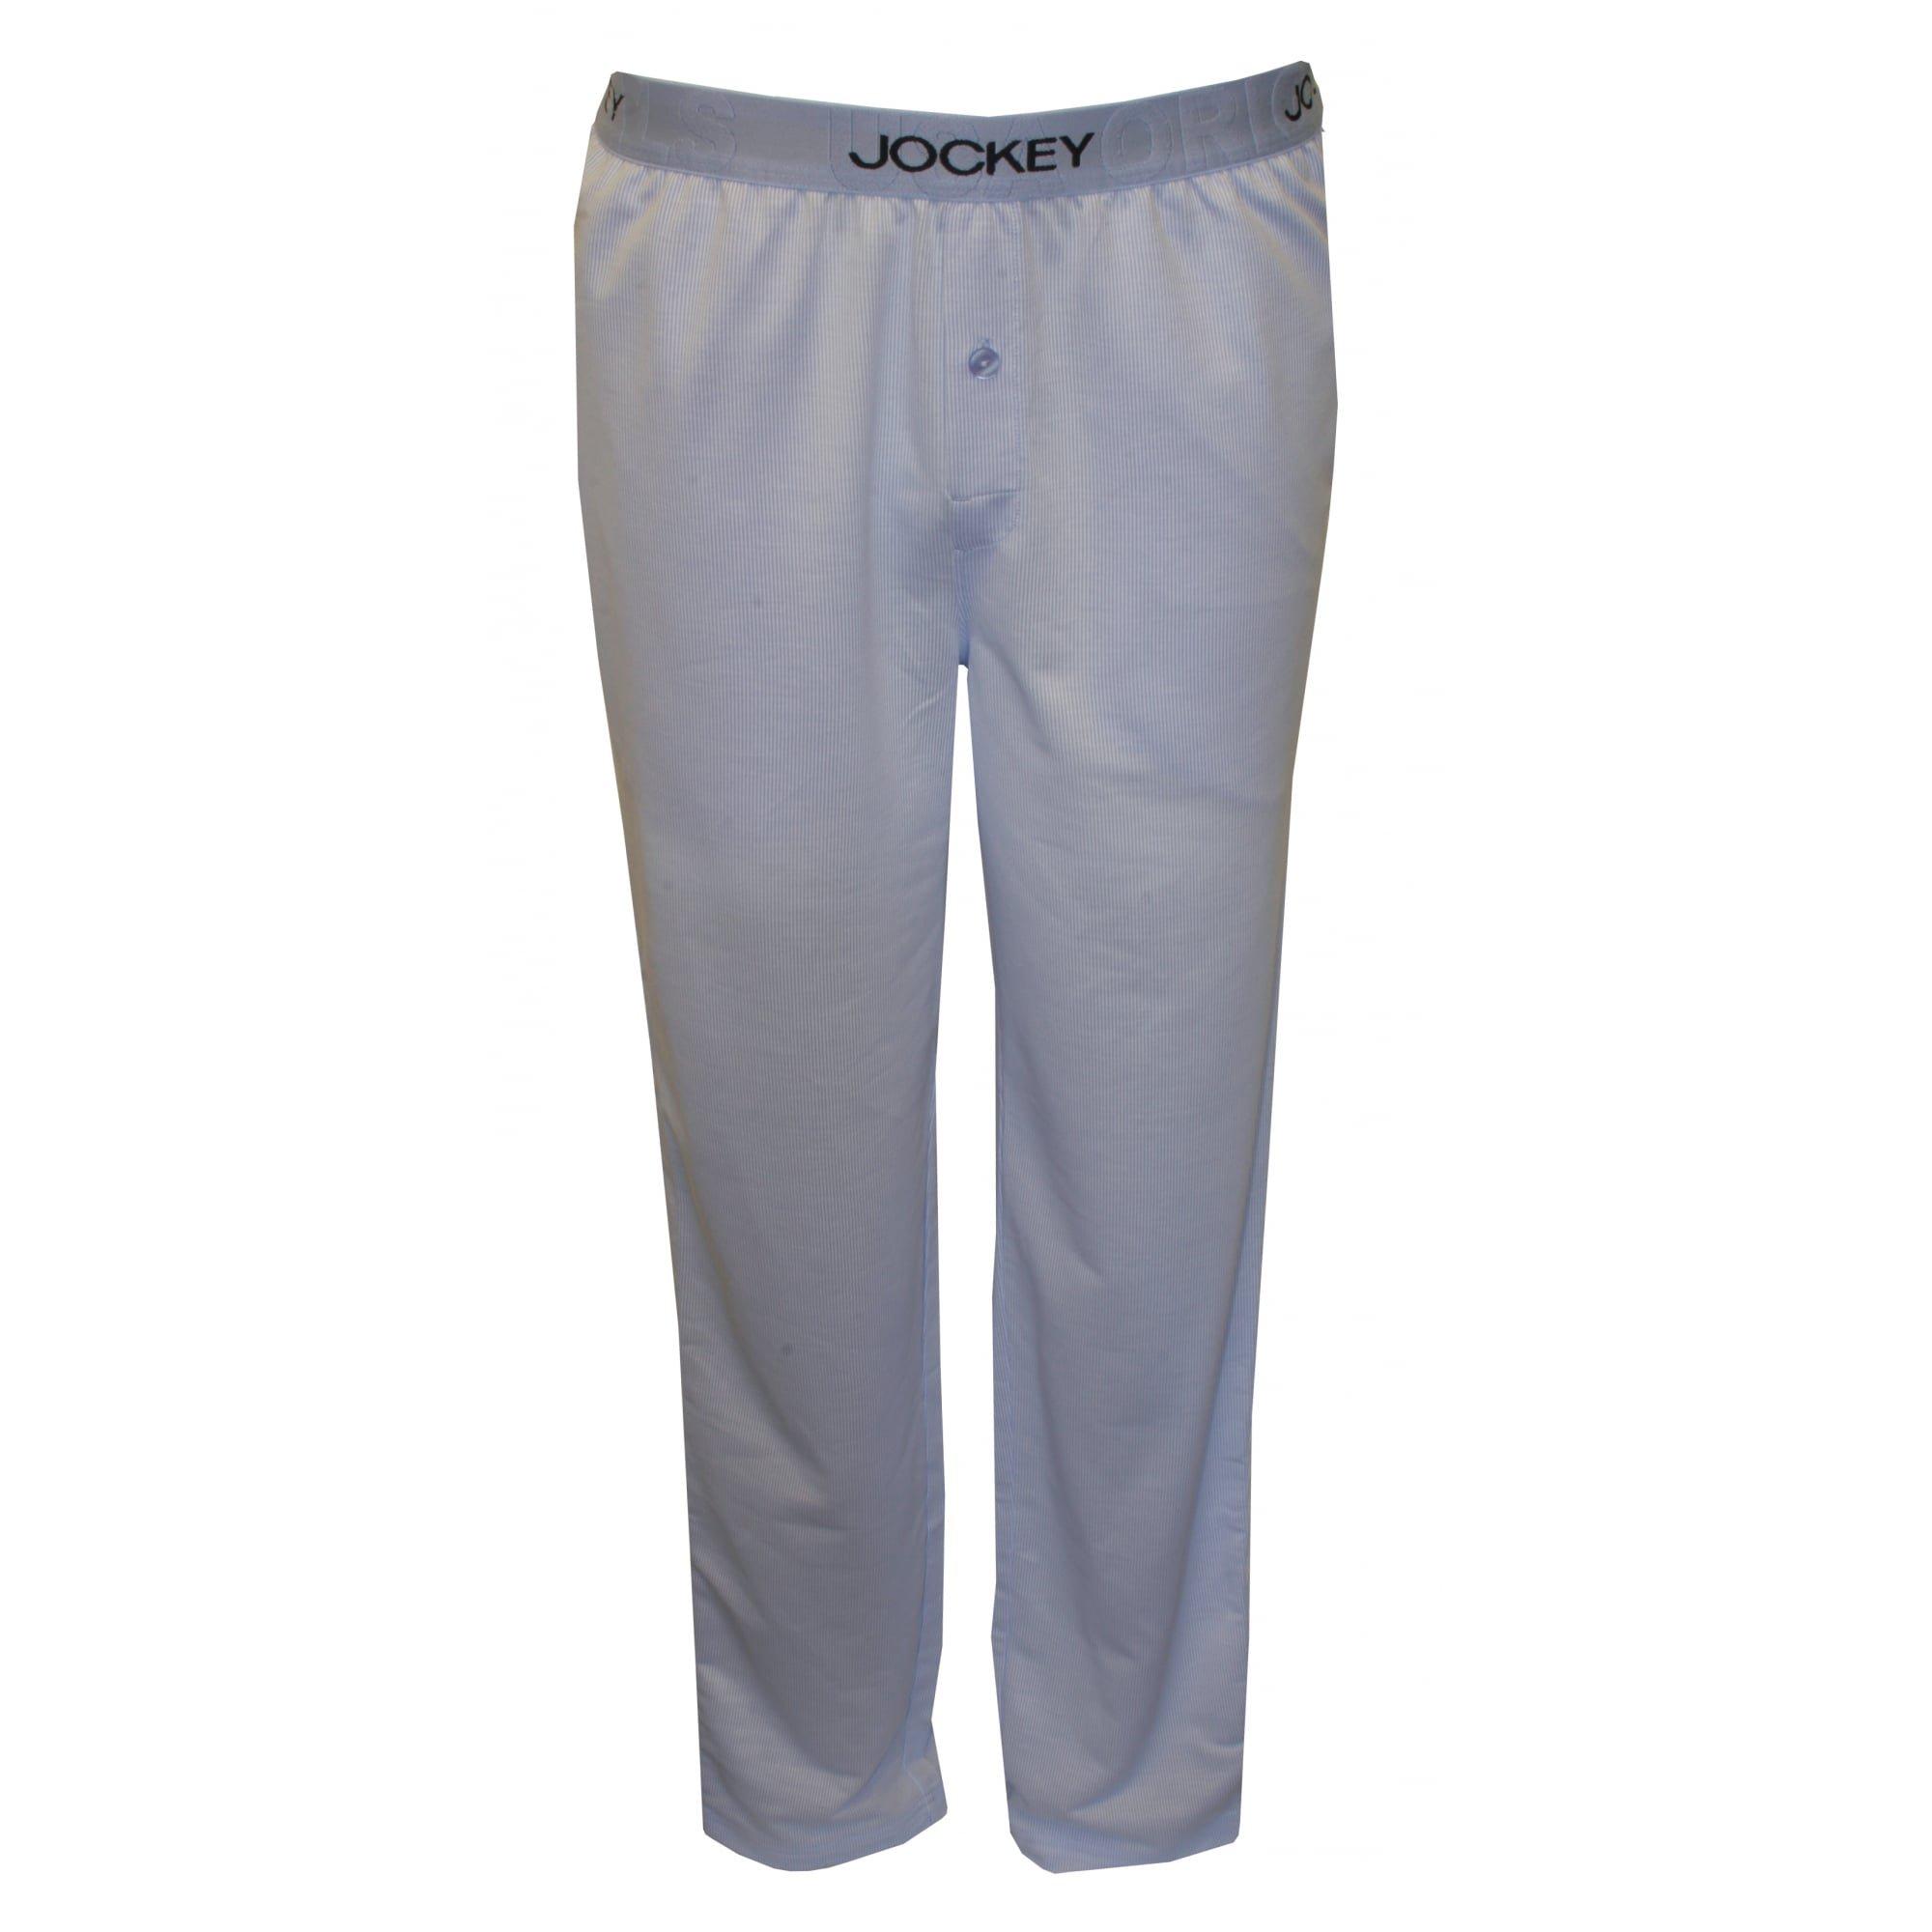 Jockey Knitted Jacquard Fine Stripes Men's Lounge Pants, Blue XX-Large Blue Fine Stripe